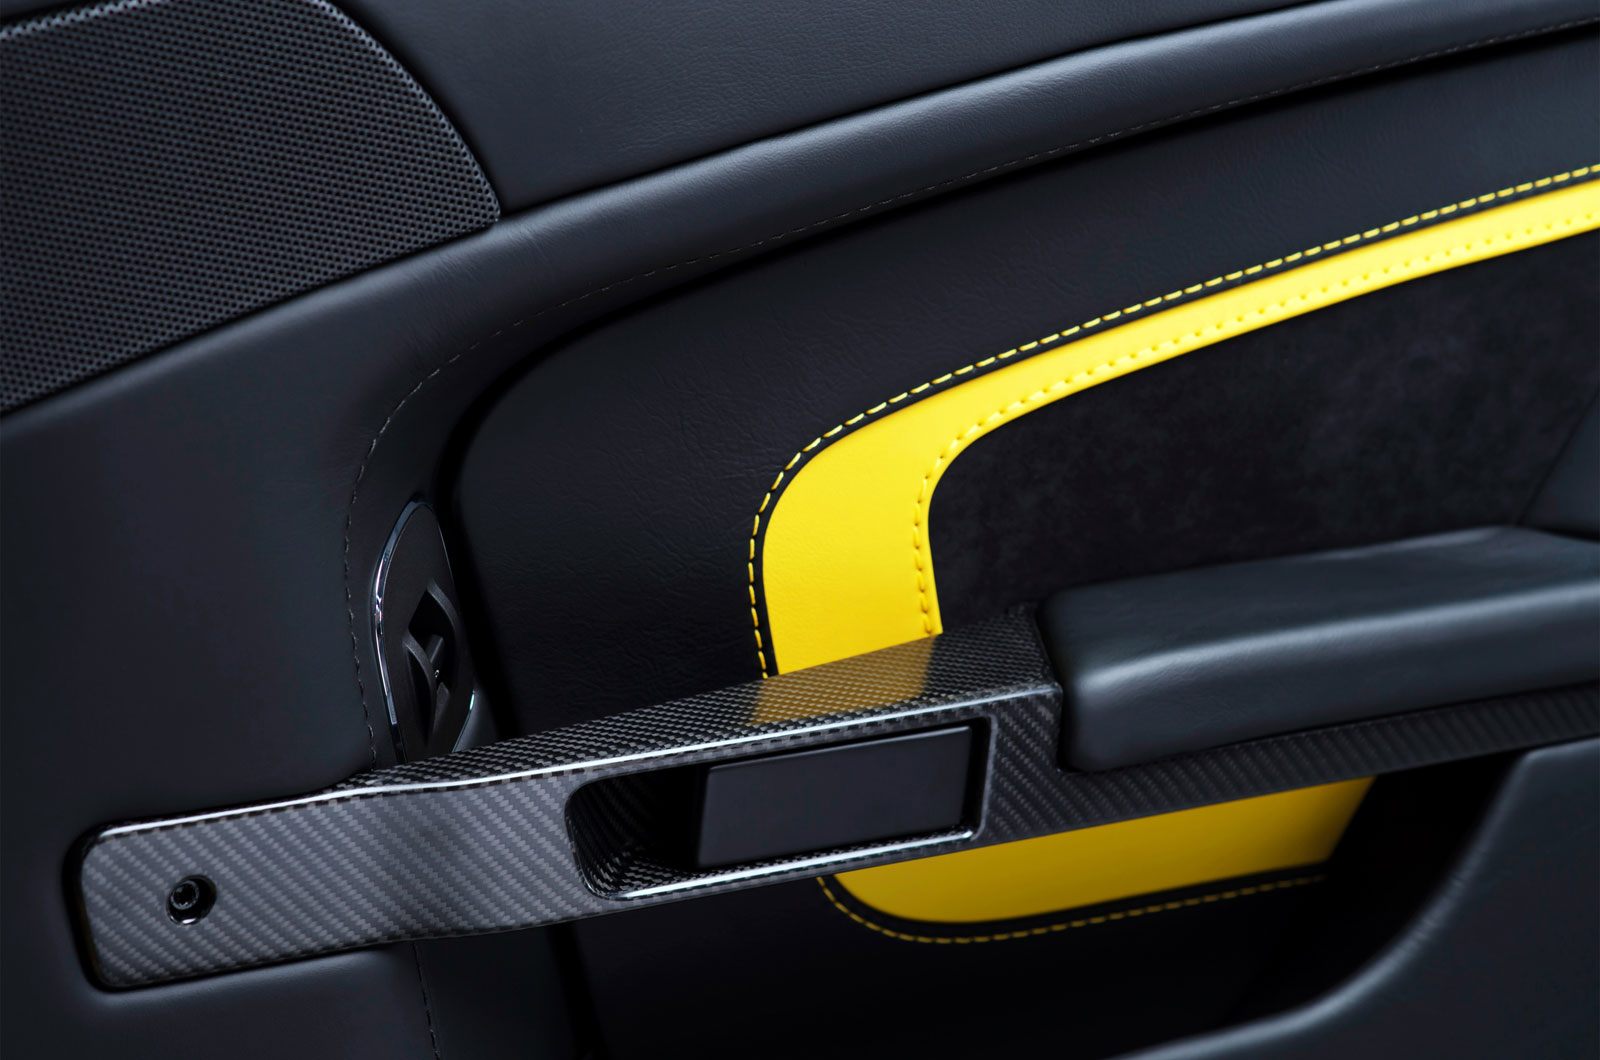 Aston Martin V12 Vantage S Door Panel Detail Car Body Design